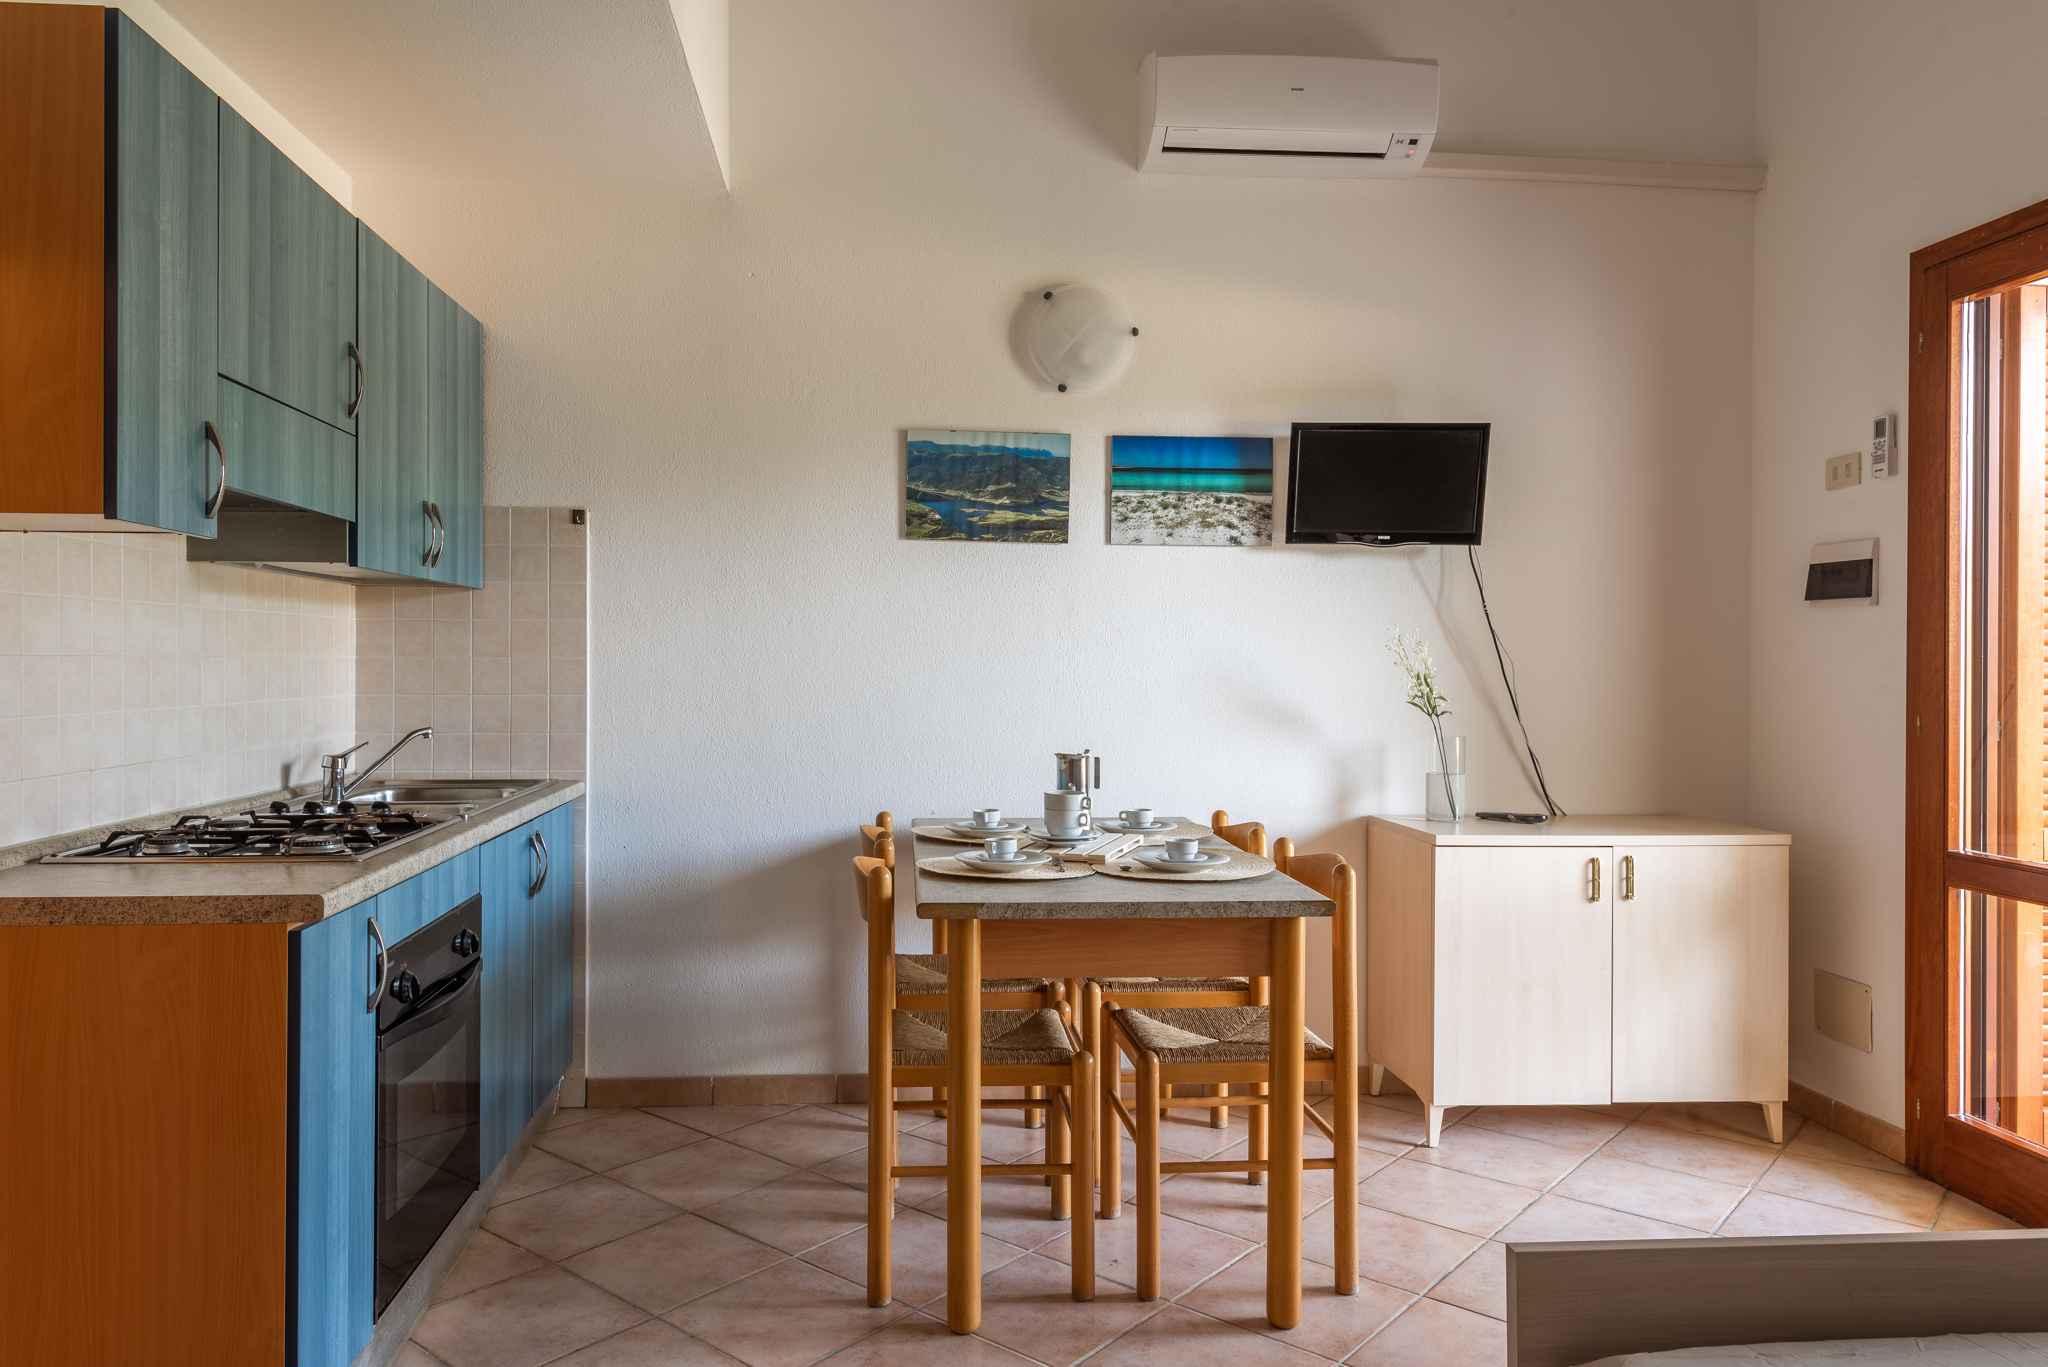 Ferienwohnung Appartamento 6 persone (2853261), Budoni, Olbia-Tempio, Sardinien, Italien, Bild 6